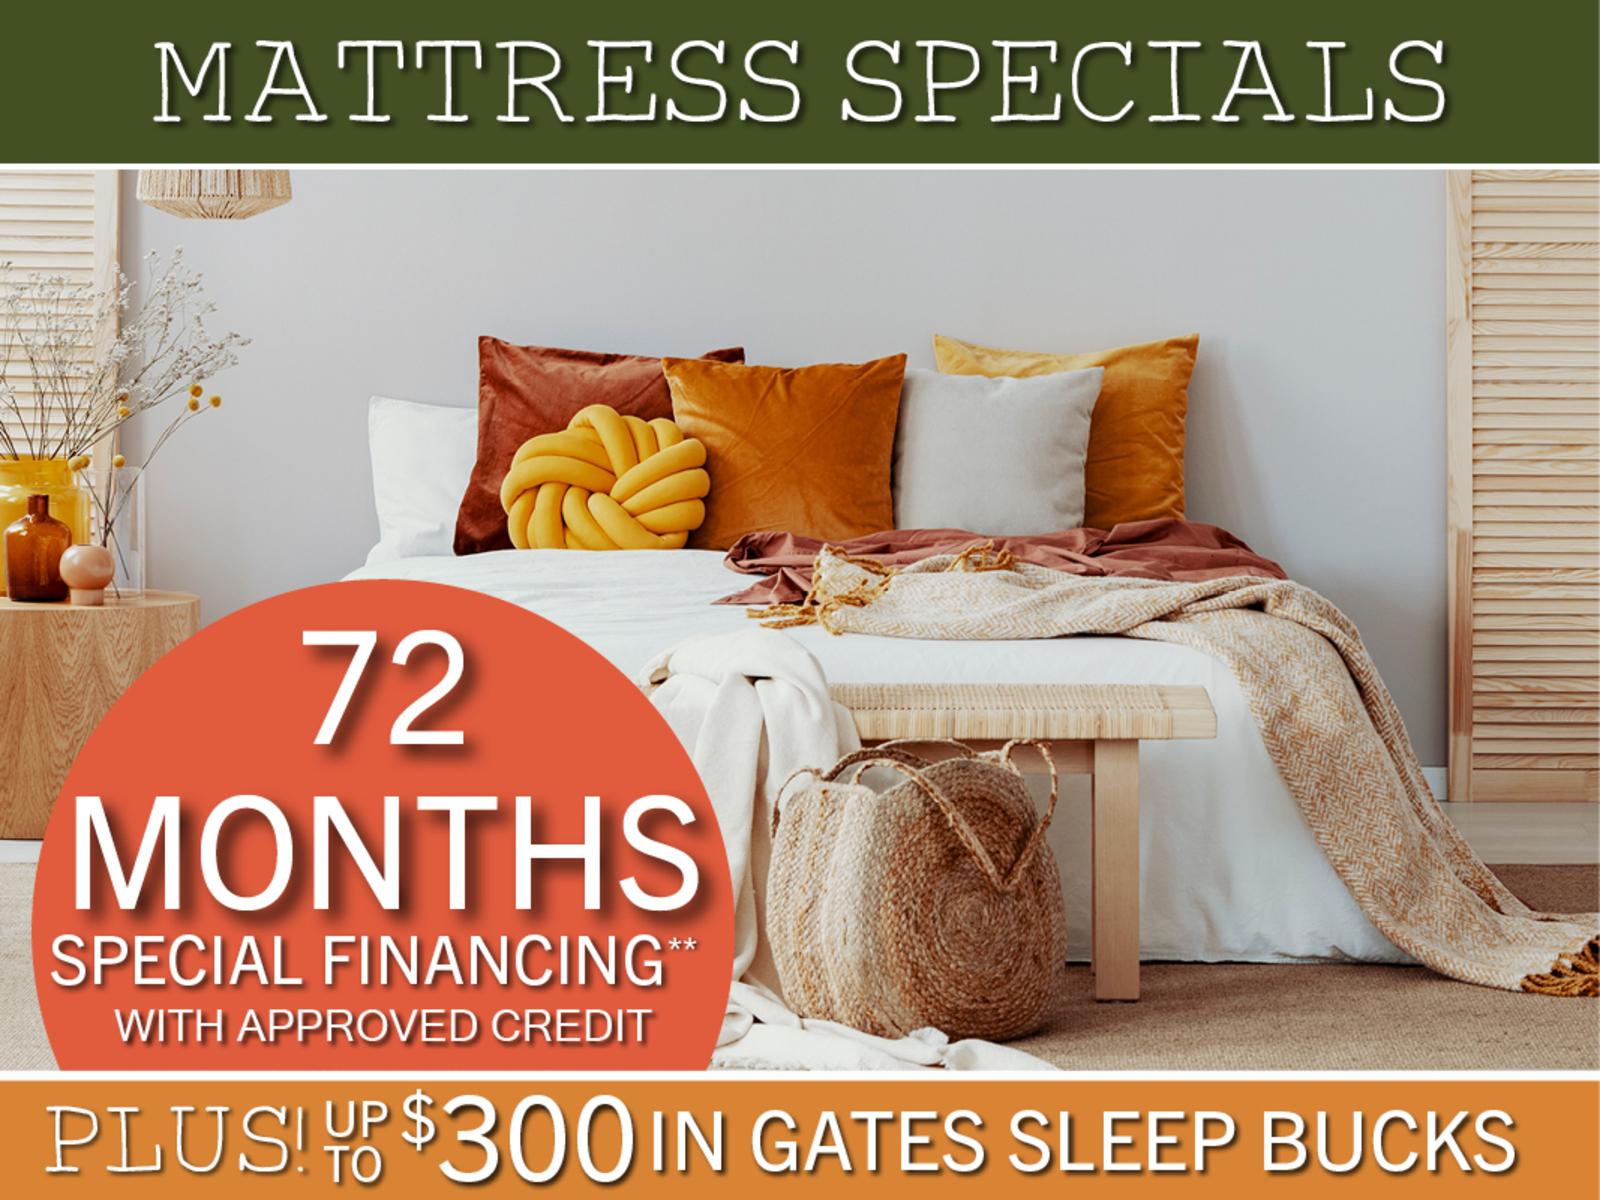 Mattress Specials